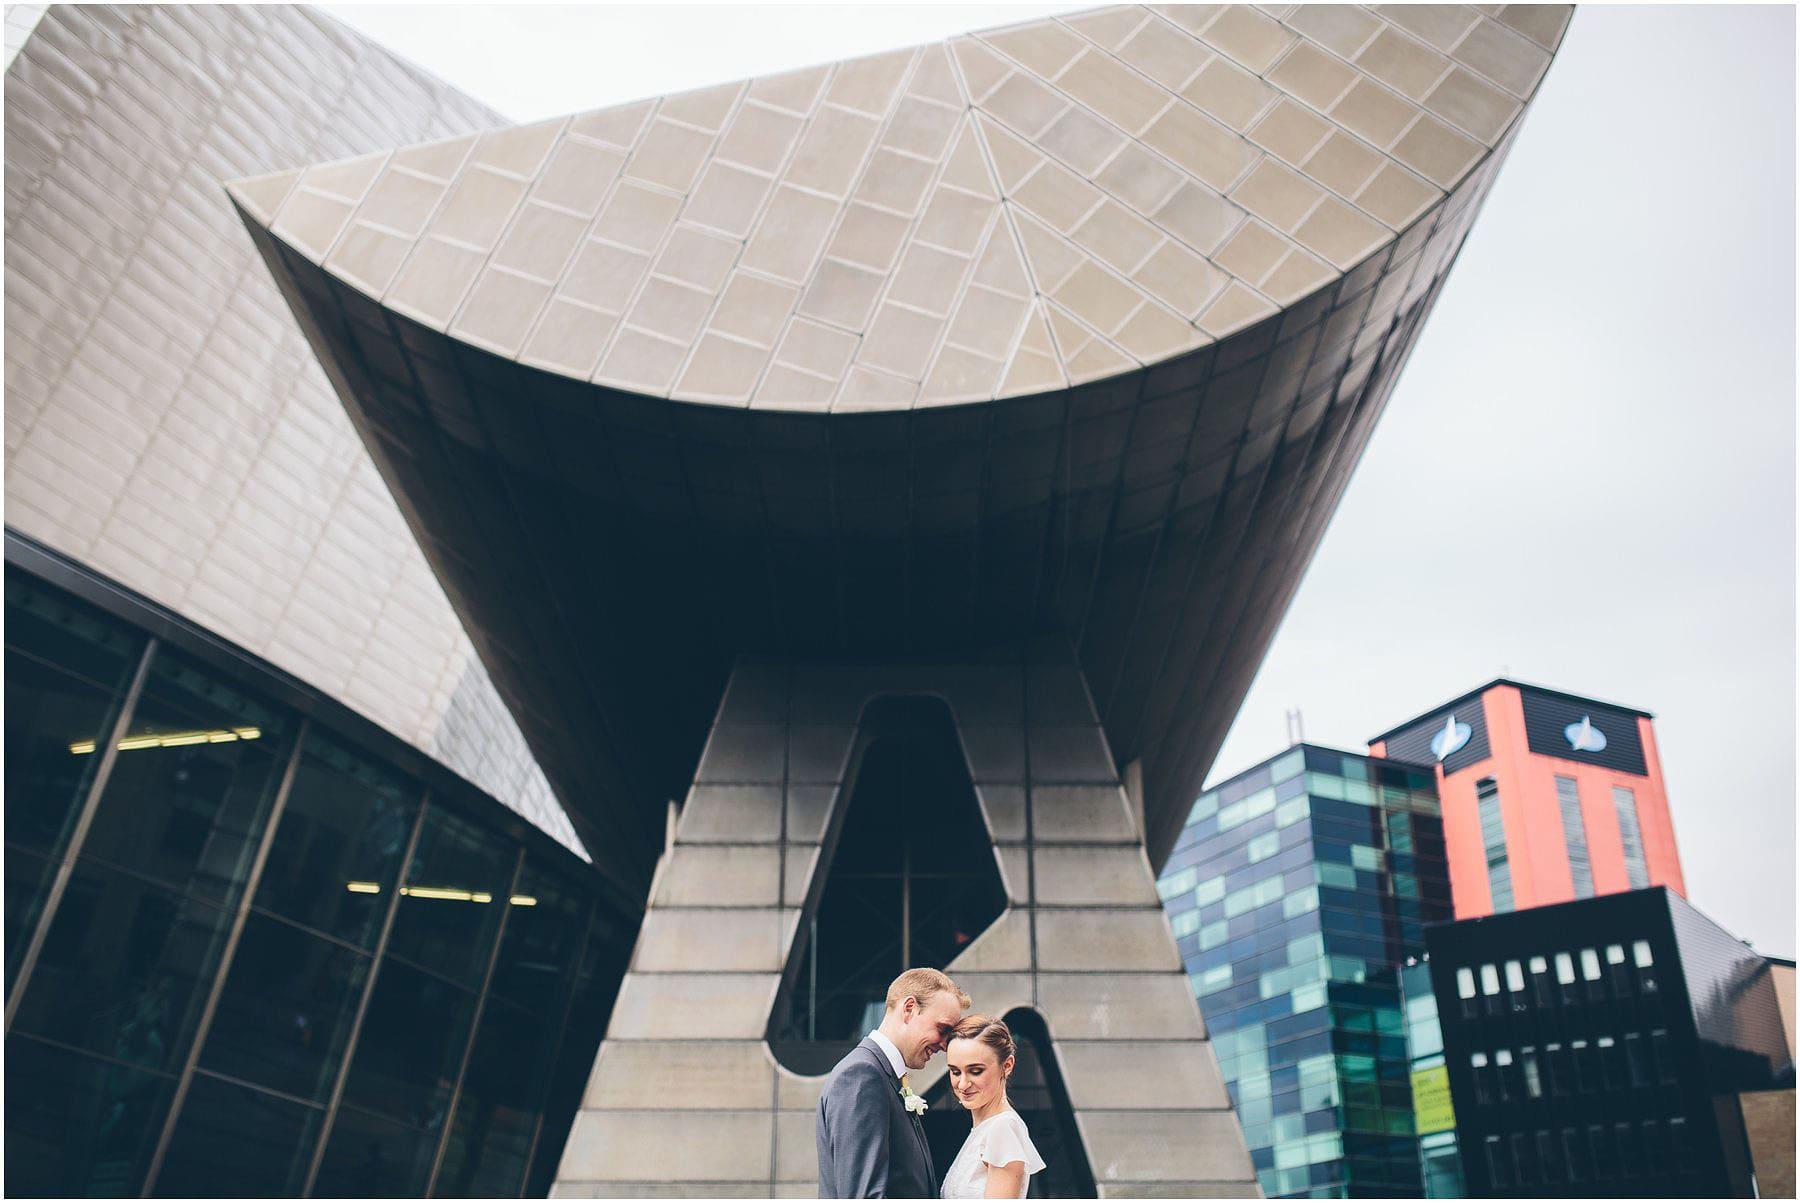 Lowry_Theatre_Wedding_Photography_0072